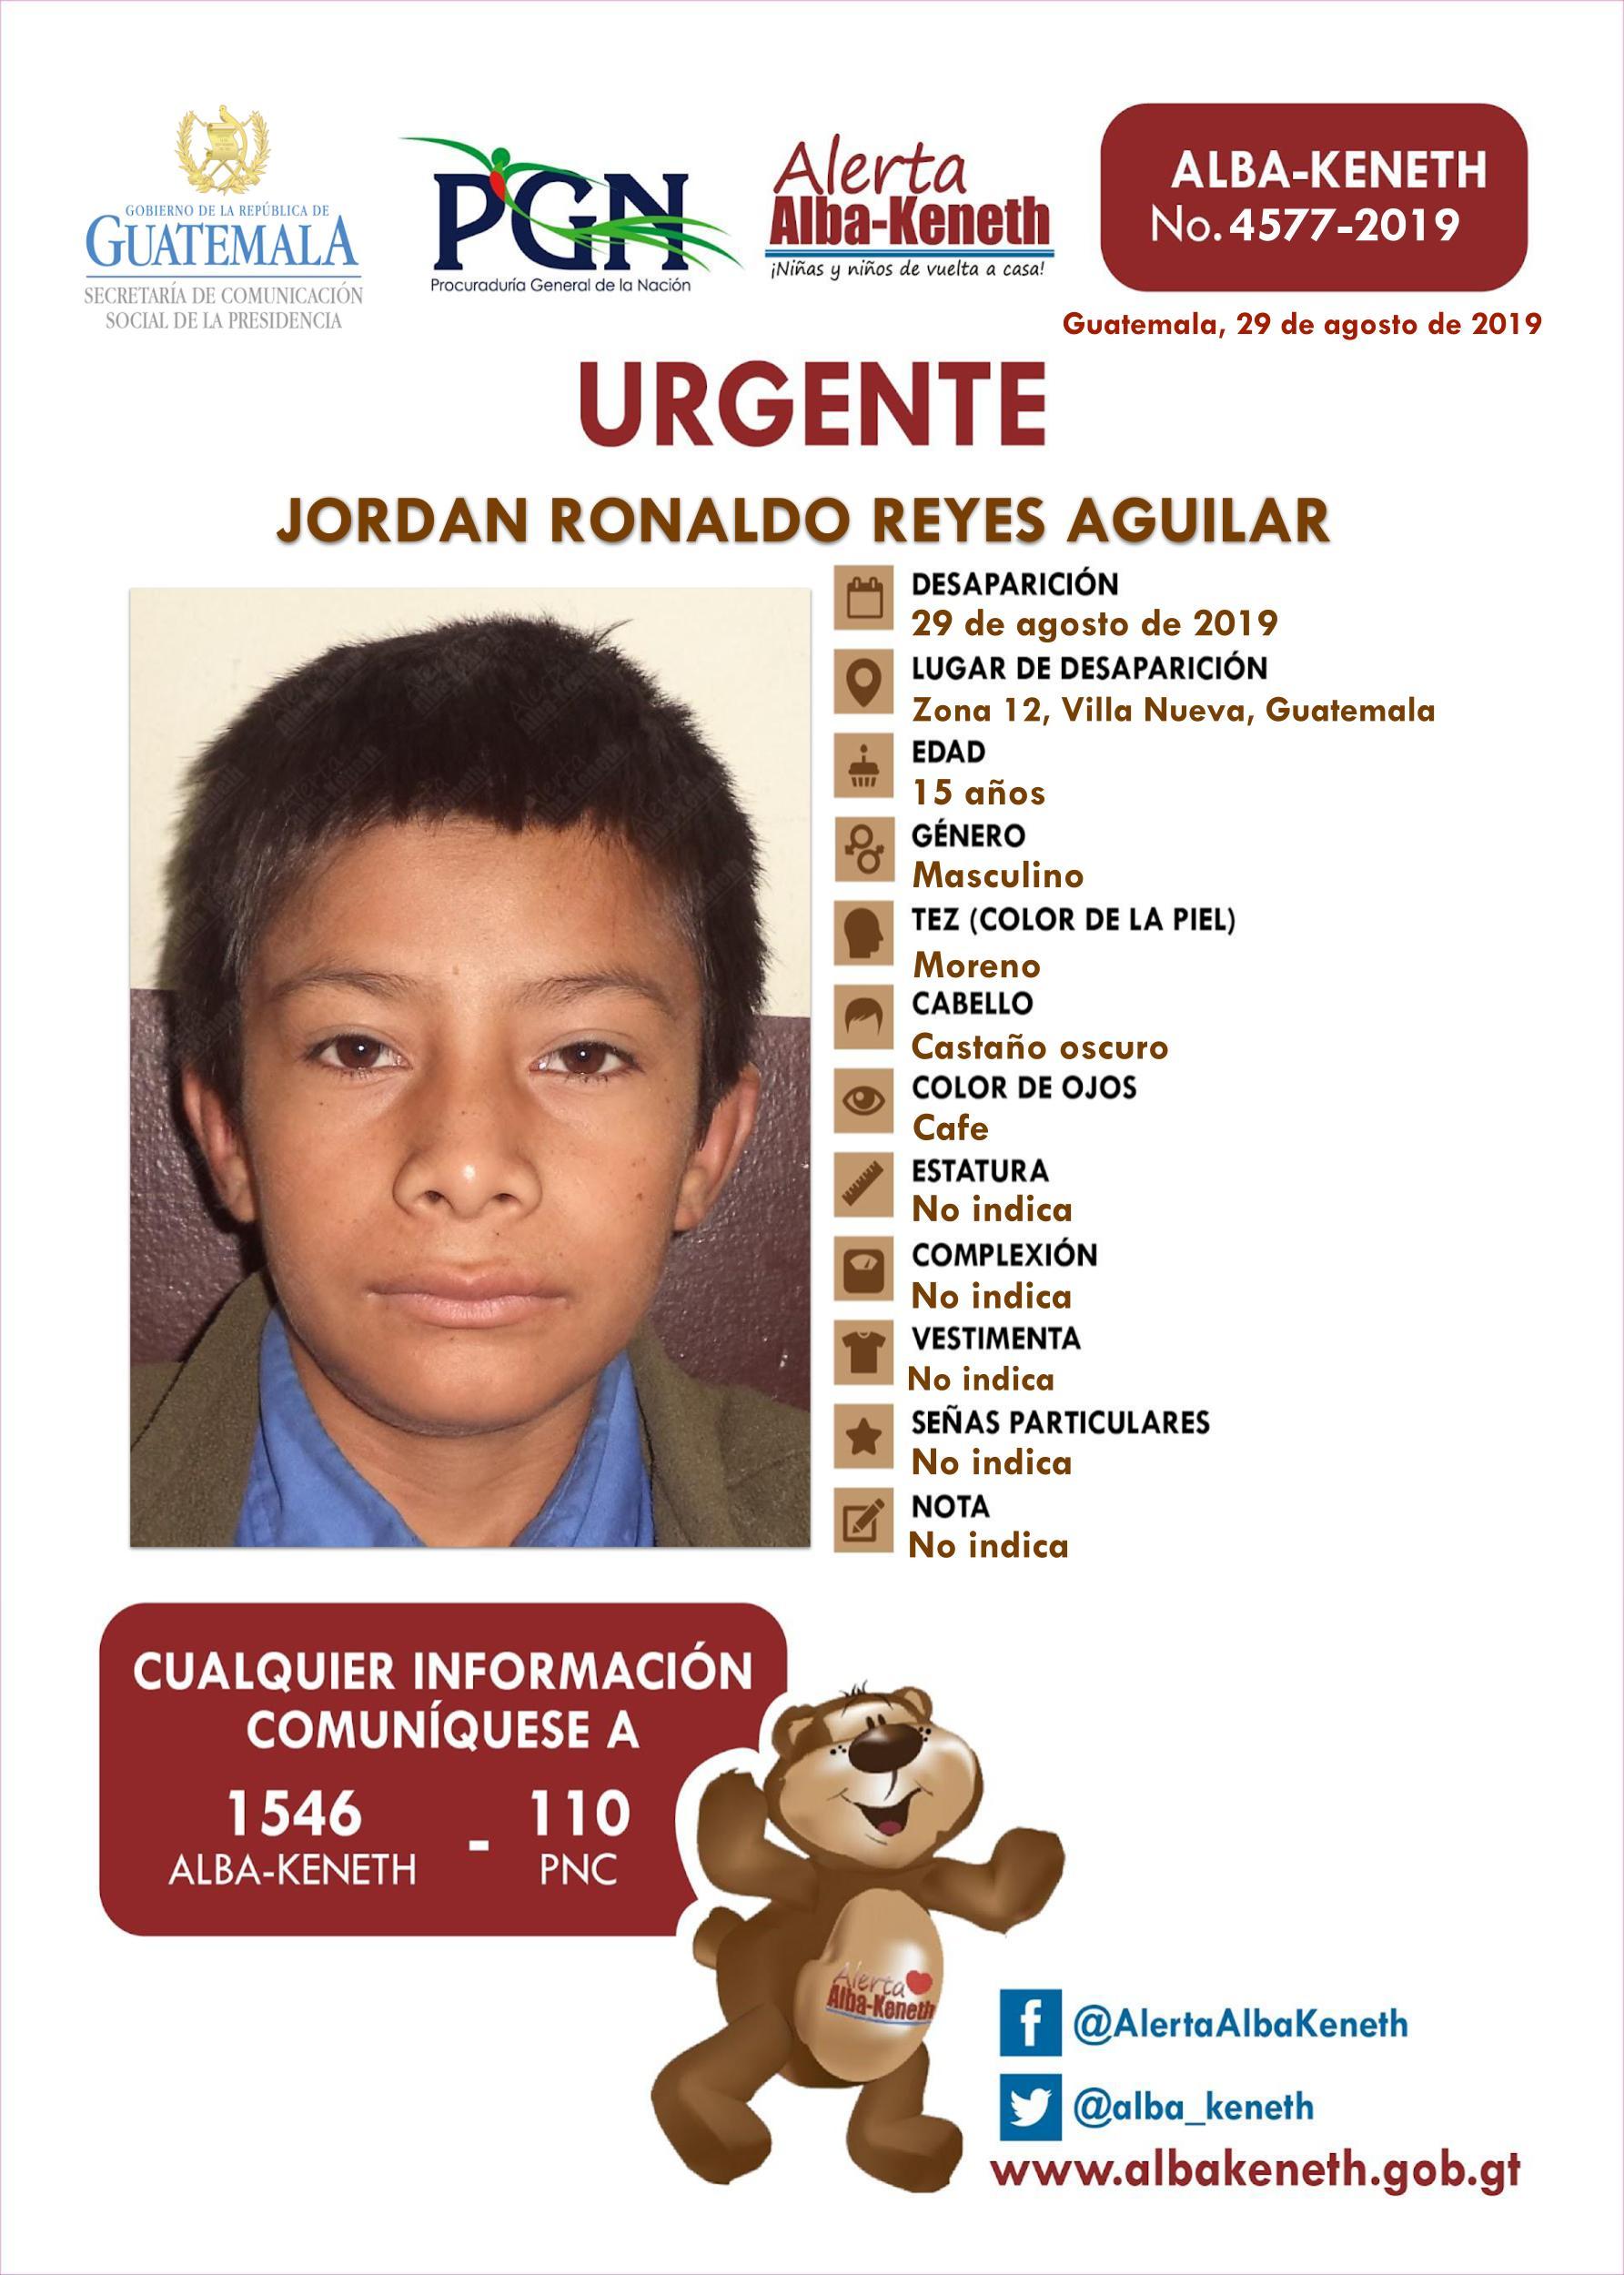 Jordan Ronaldo Reyes Aguilar